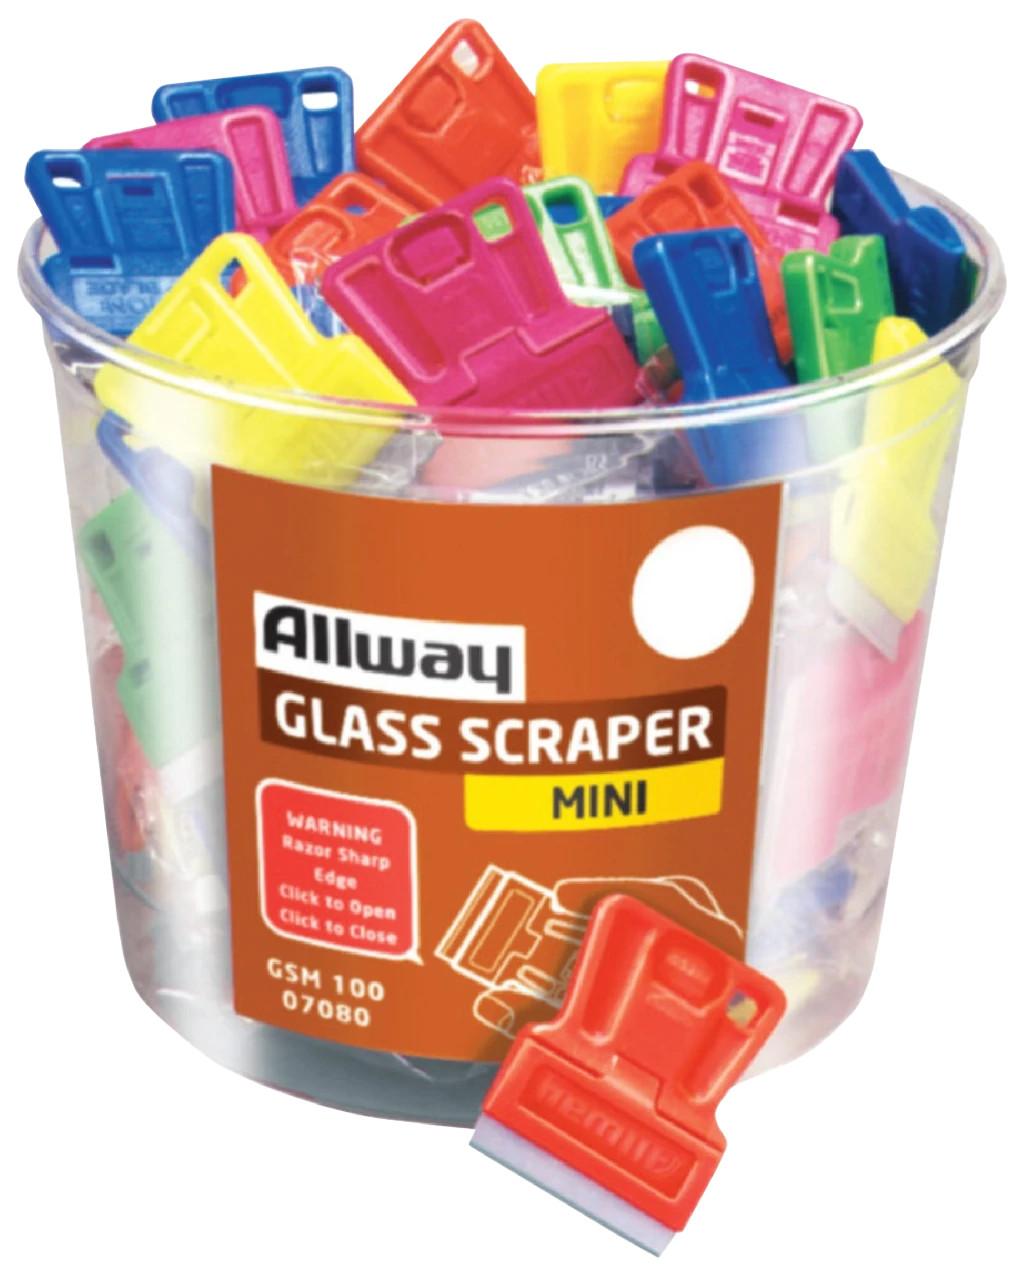 MINI GLASS SCRAPER BUCKET